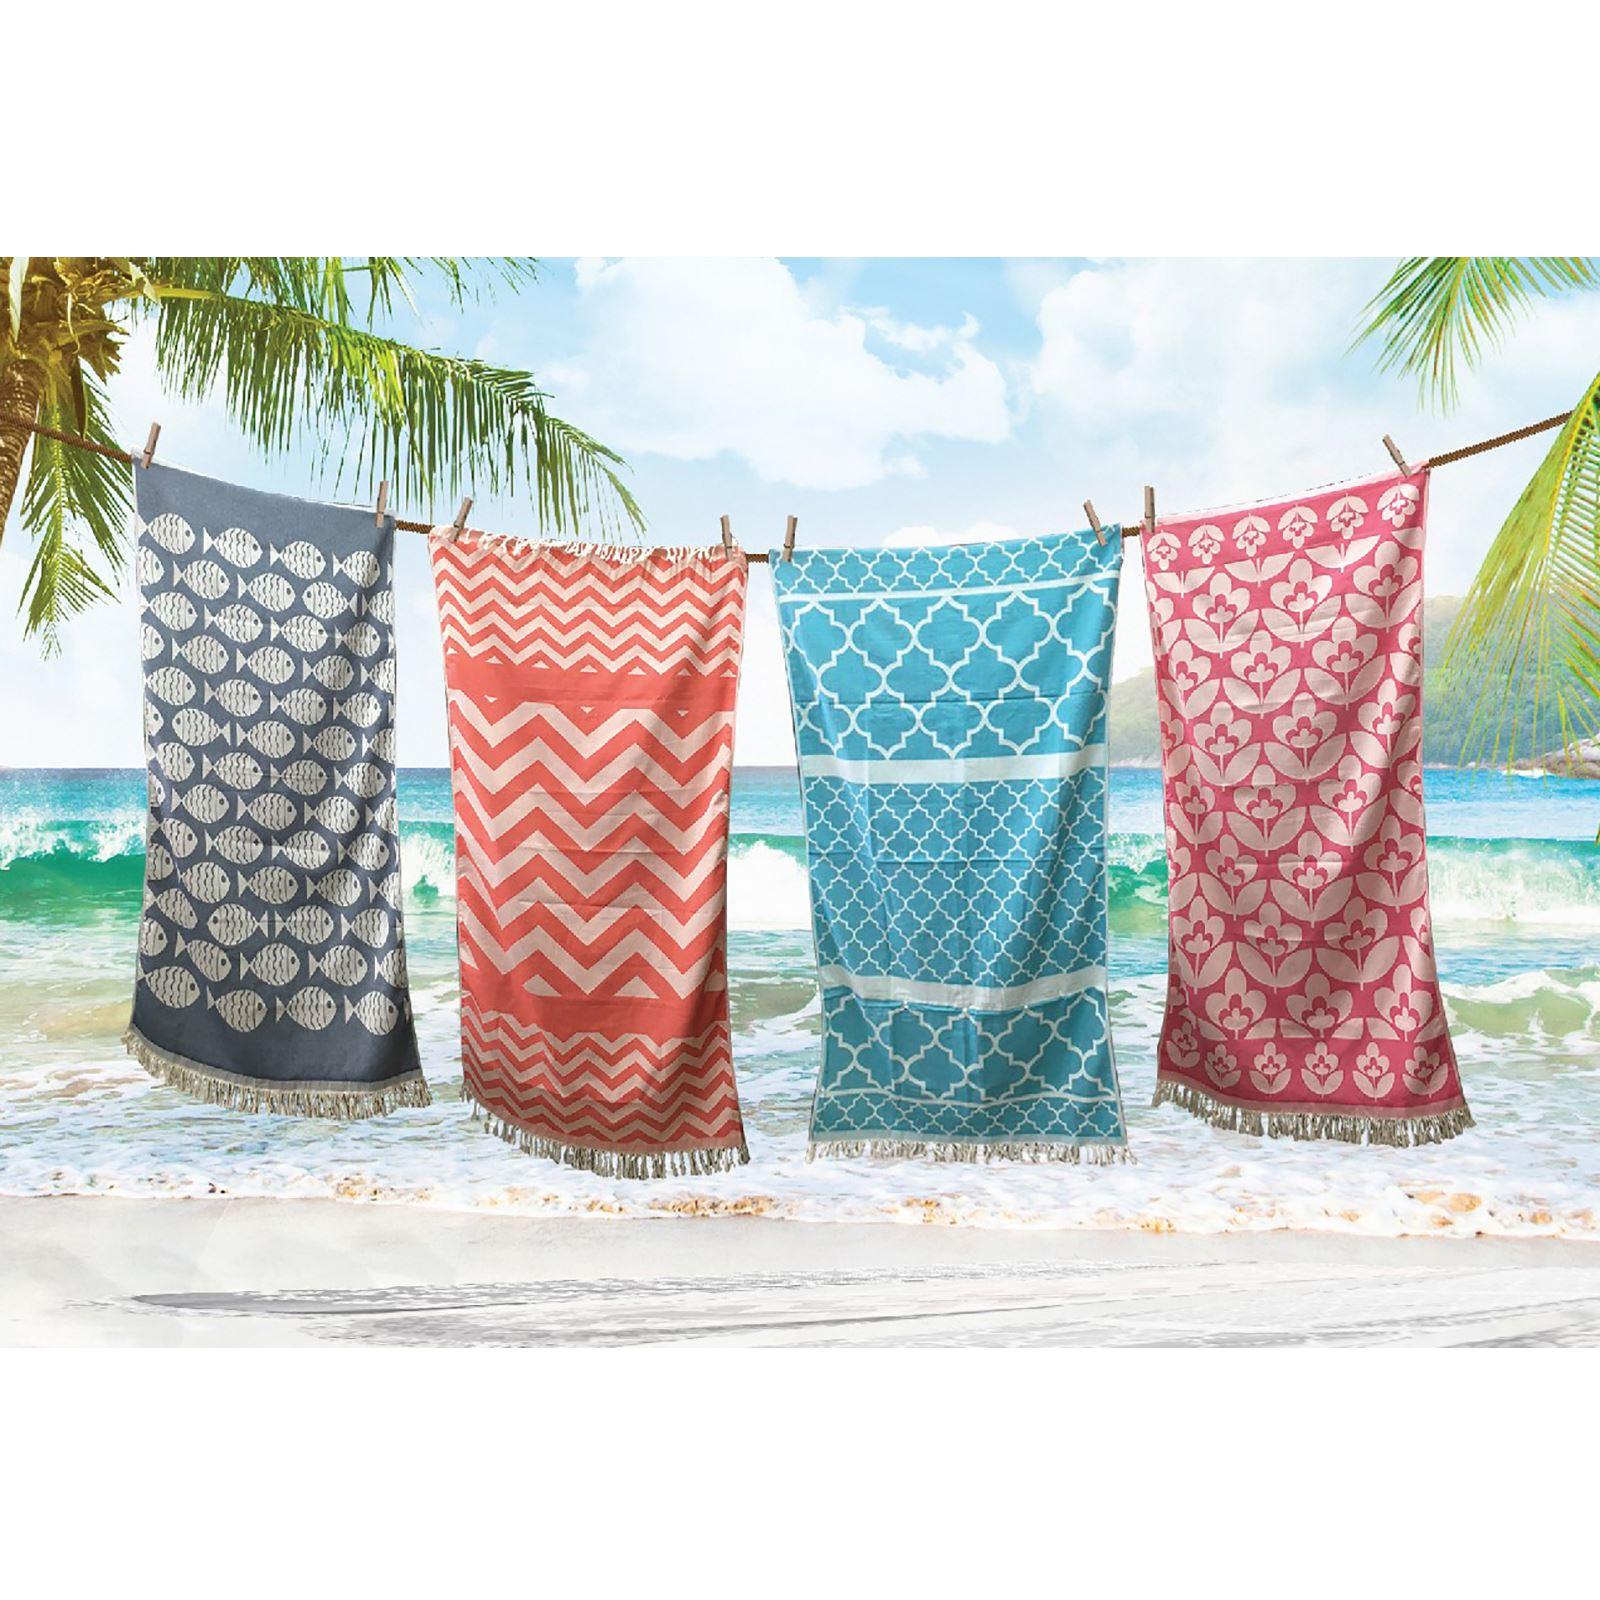 Absorbent-Woven-Hammam-Beach-Towel-100-Egyptian-Cotton-Quick-Drying-85x160cm thumbnail 3